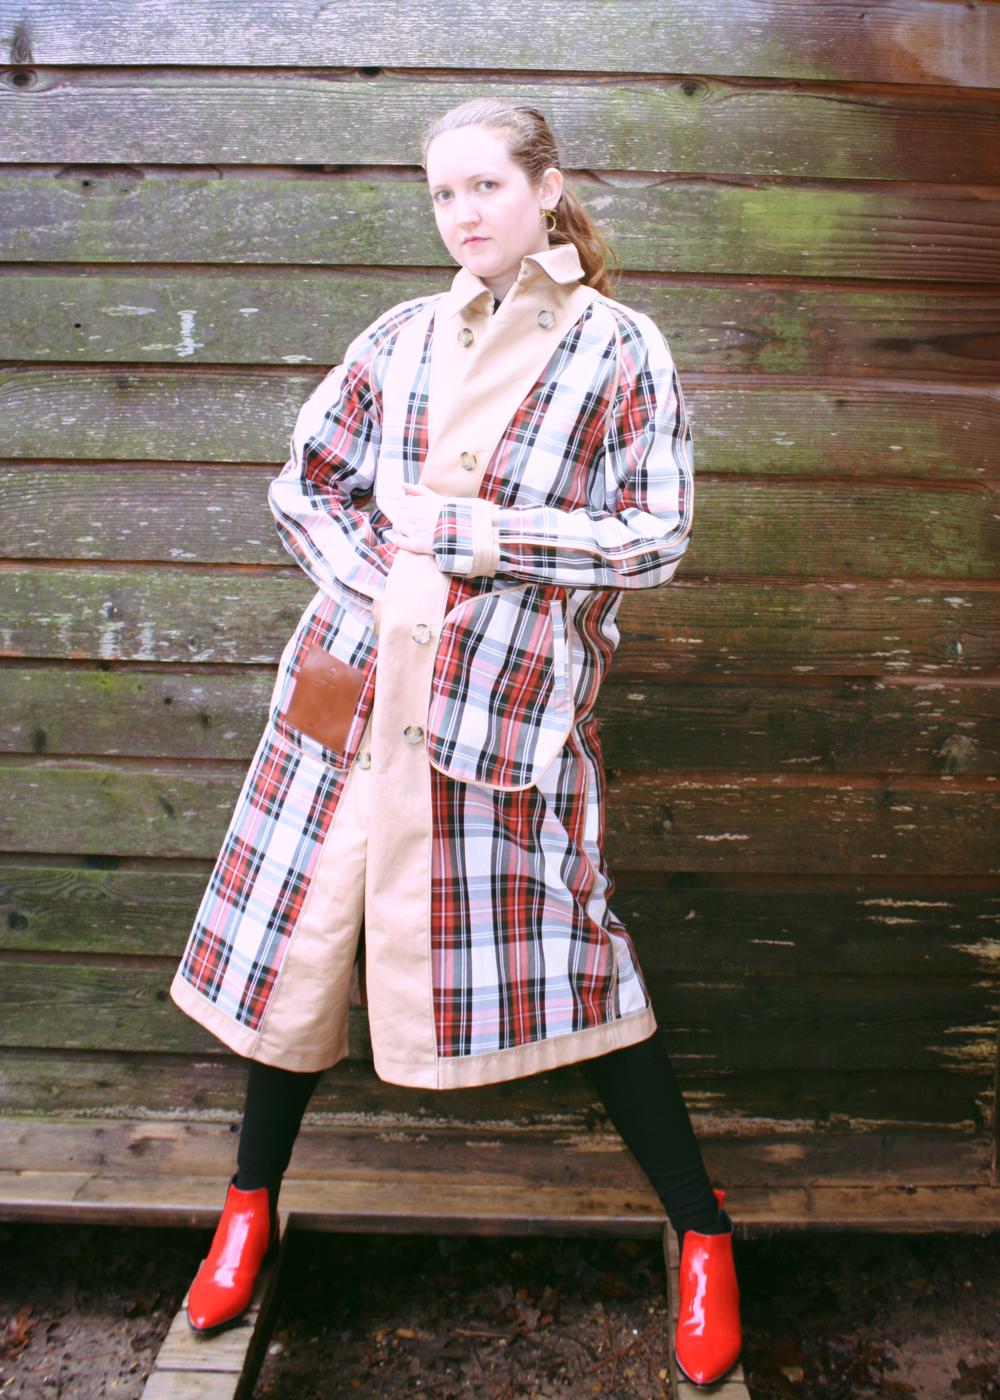 LOFT Gray Shirtdress + Dolce Vita Red Boots + J.W. Anderson & Uniqlo Trench